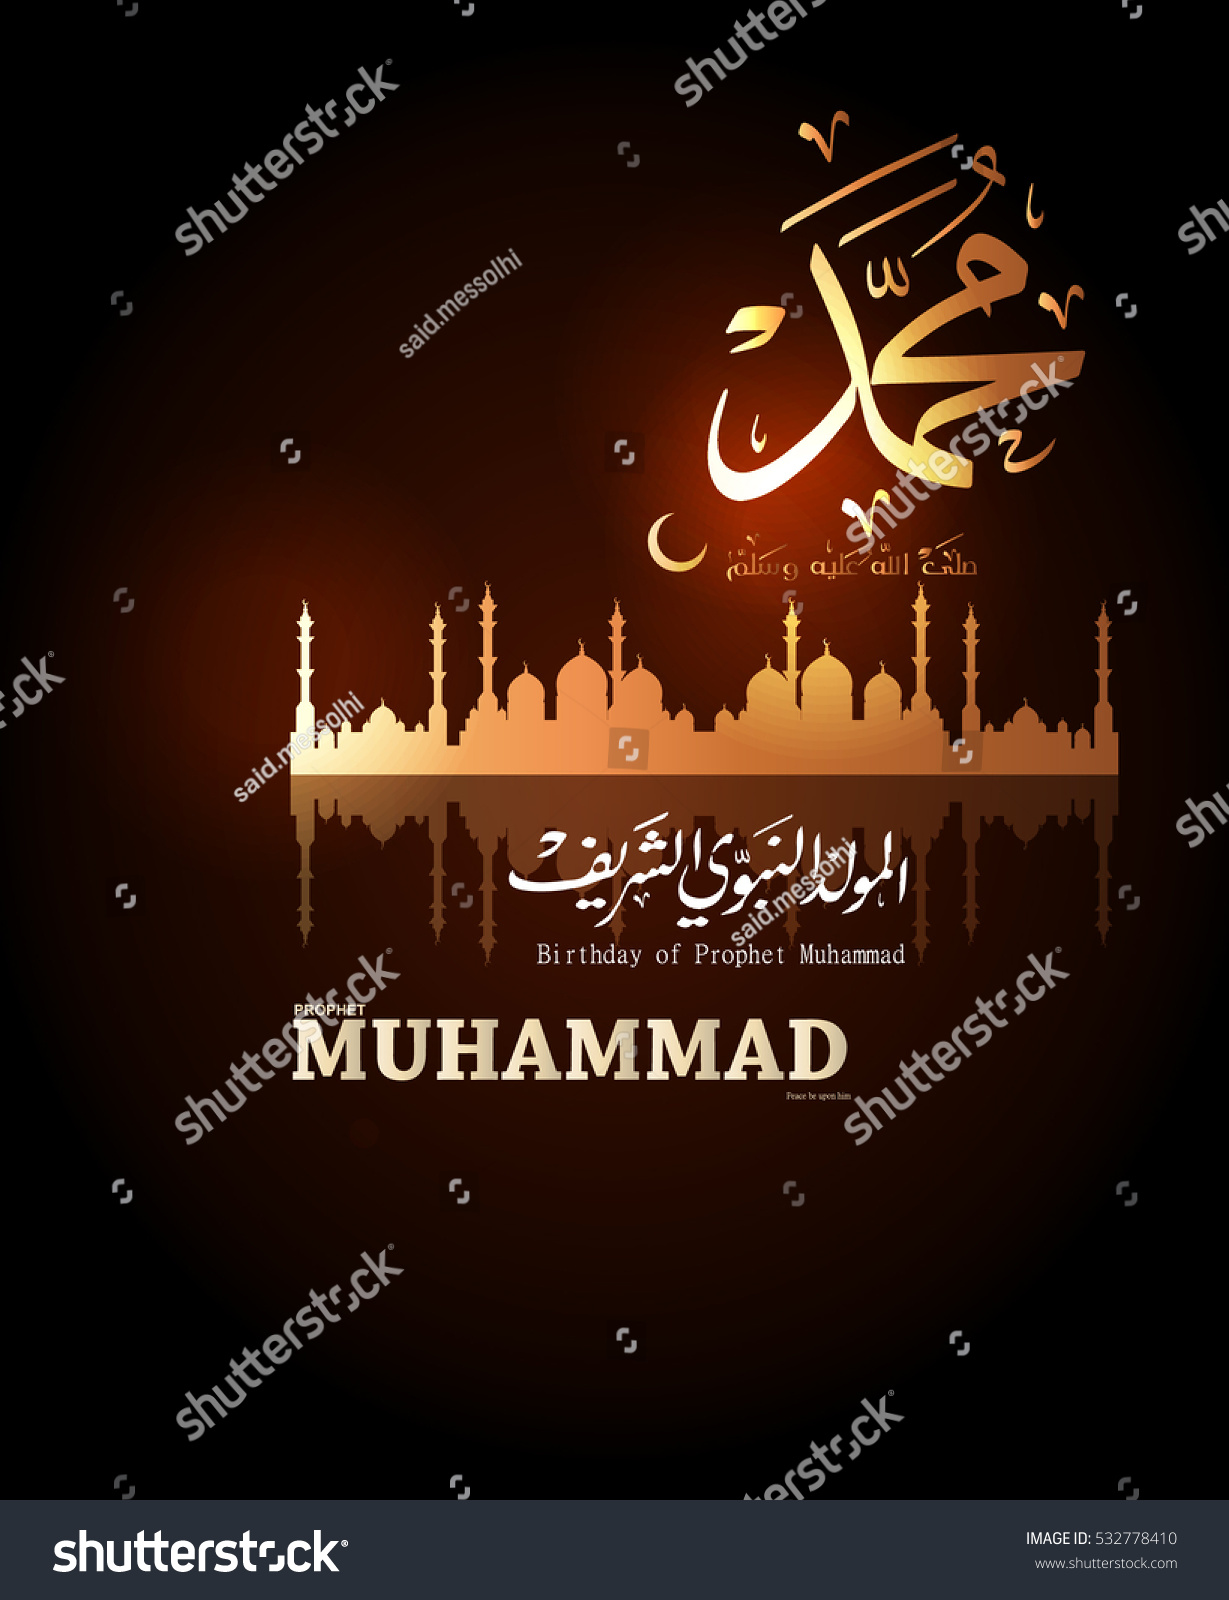 Islamic Birthday Cards Gallery Free Birthday Cards